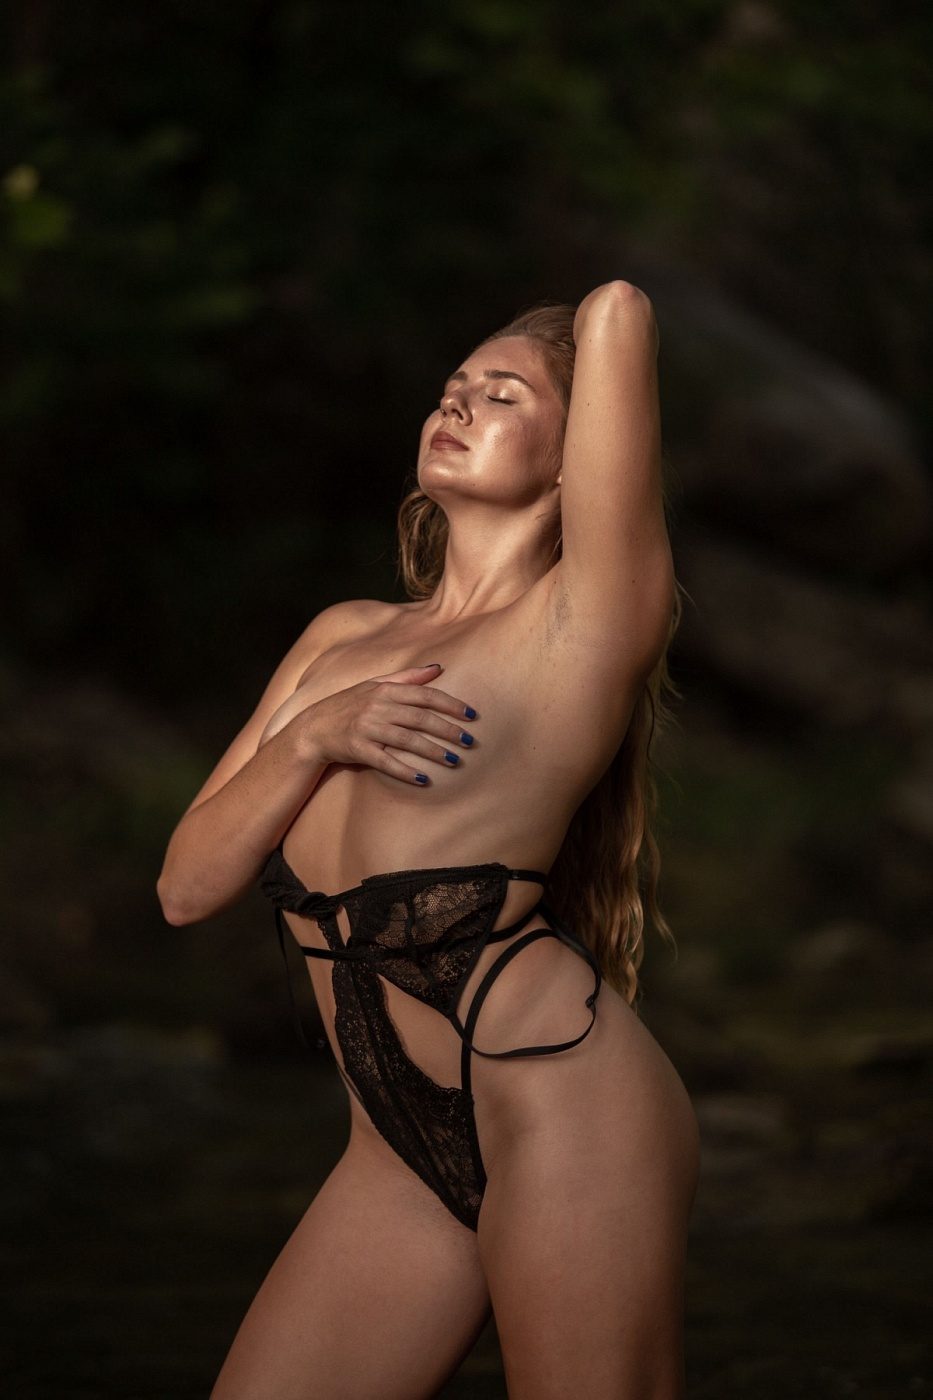 Natalie Divine